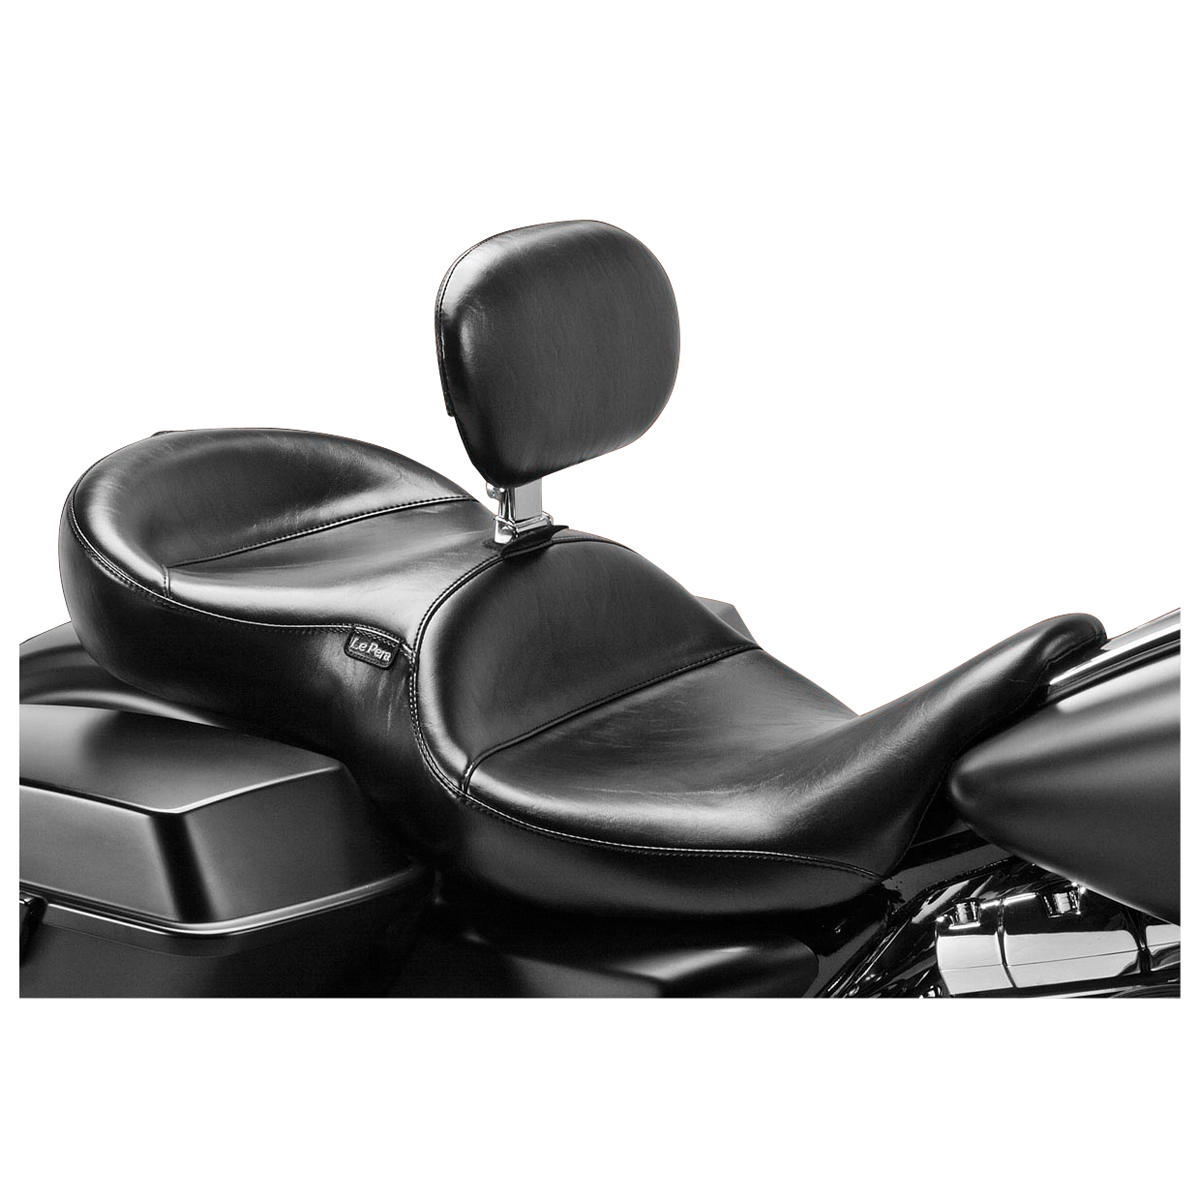 Le Pera Continental Seat w/ Driver Backrest